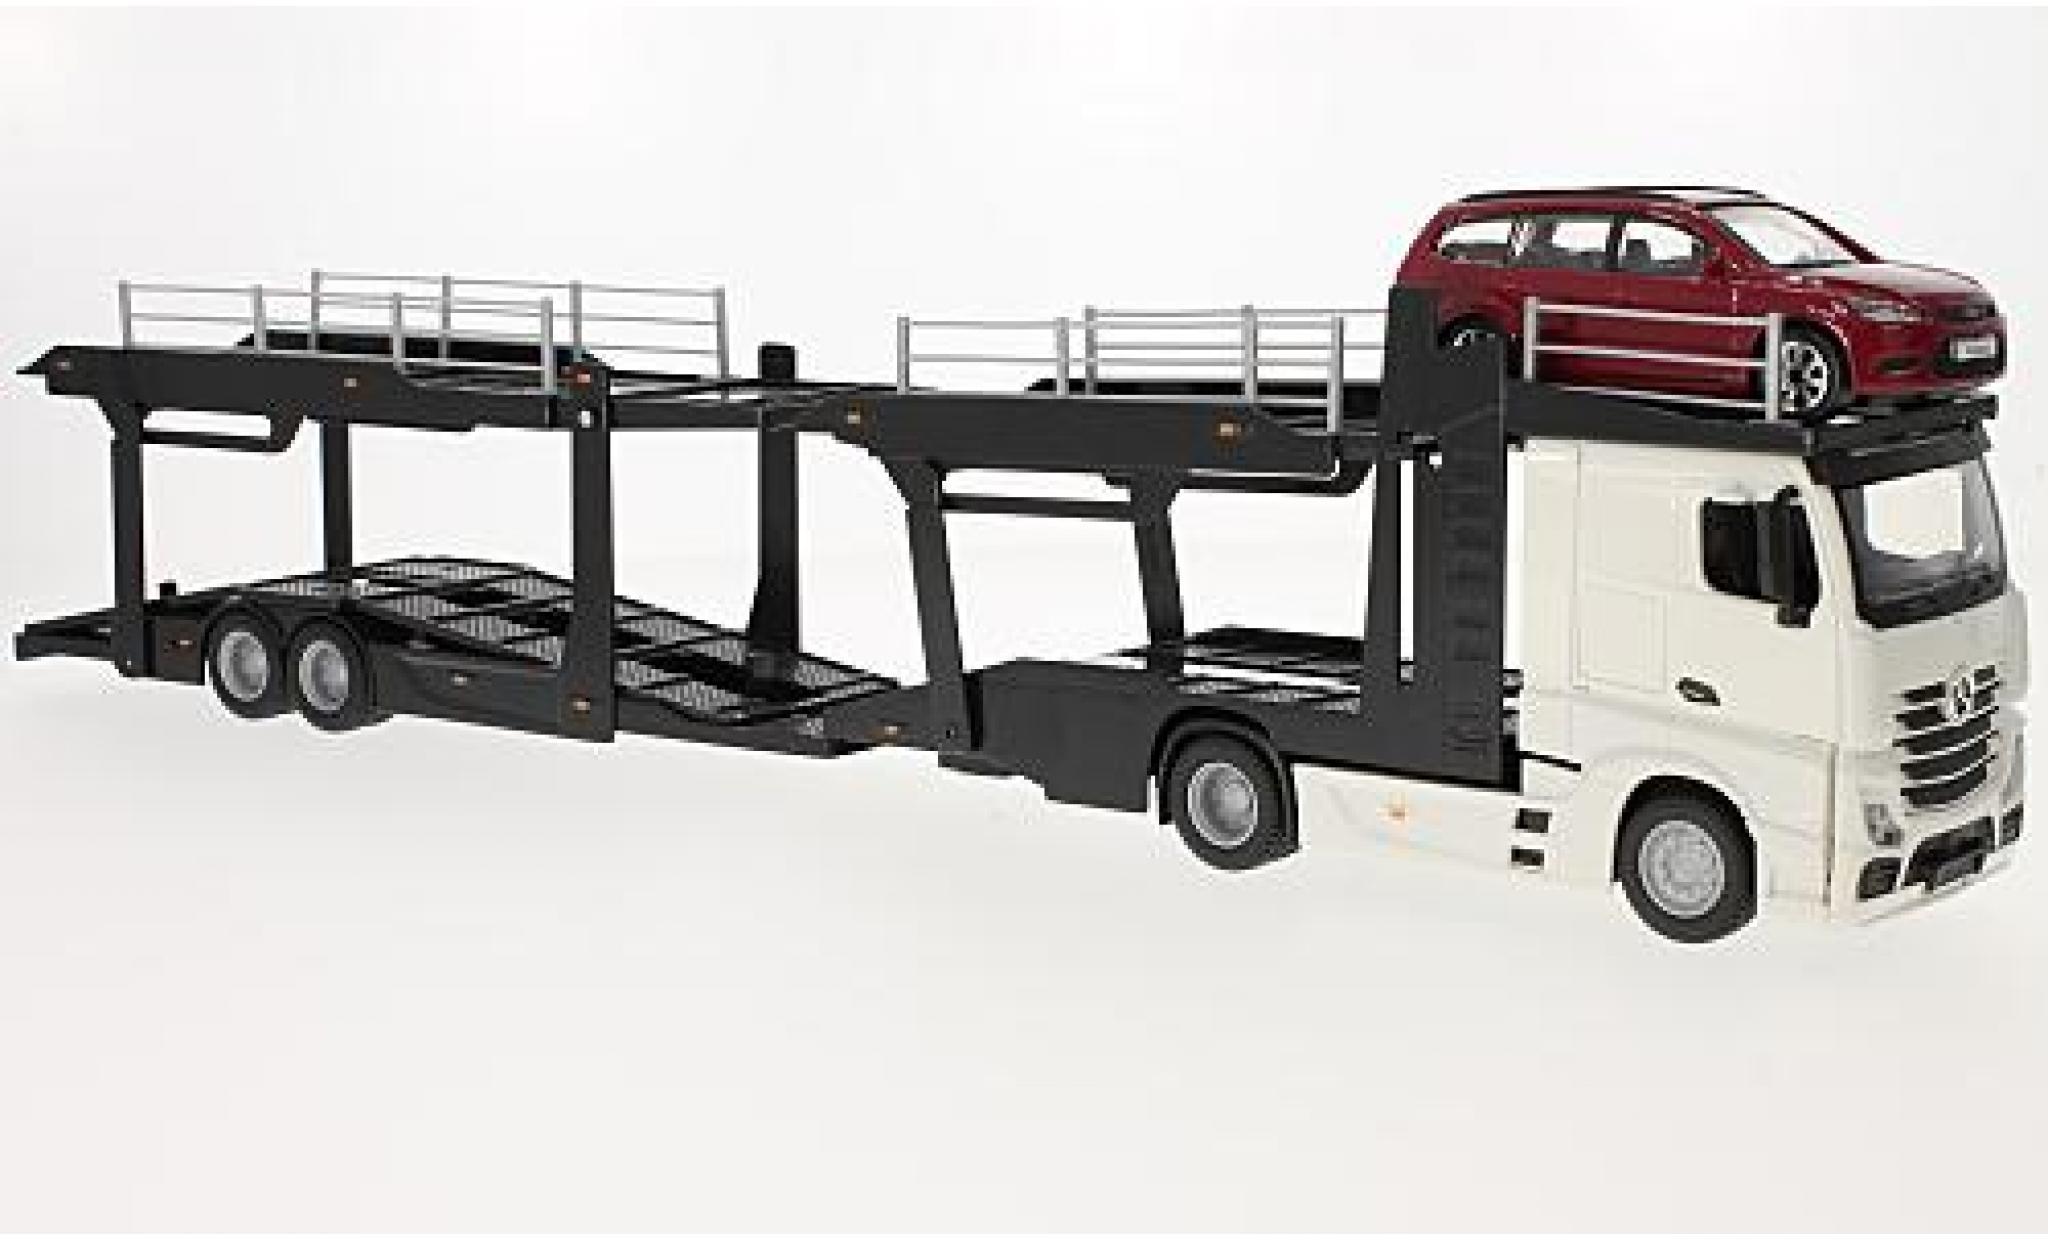 Mercedes Actros 1/43 Bburago 2545 blanche camion de transport de voiture avec Ford Focus Turnier